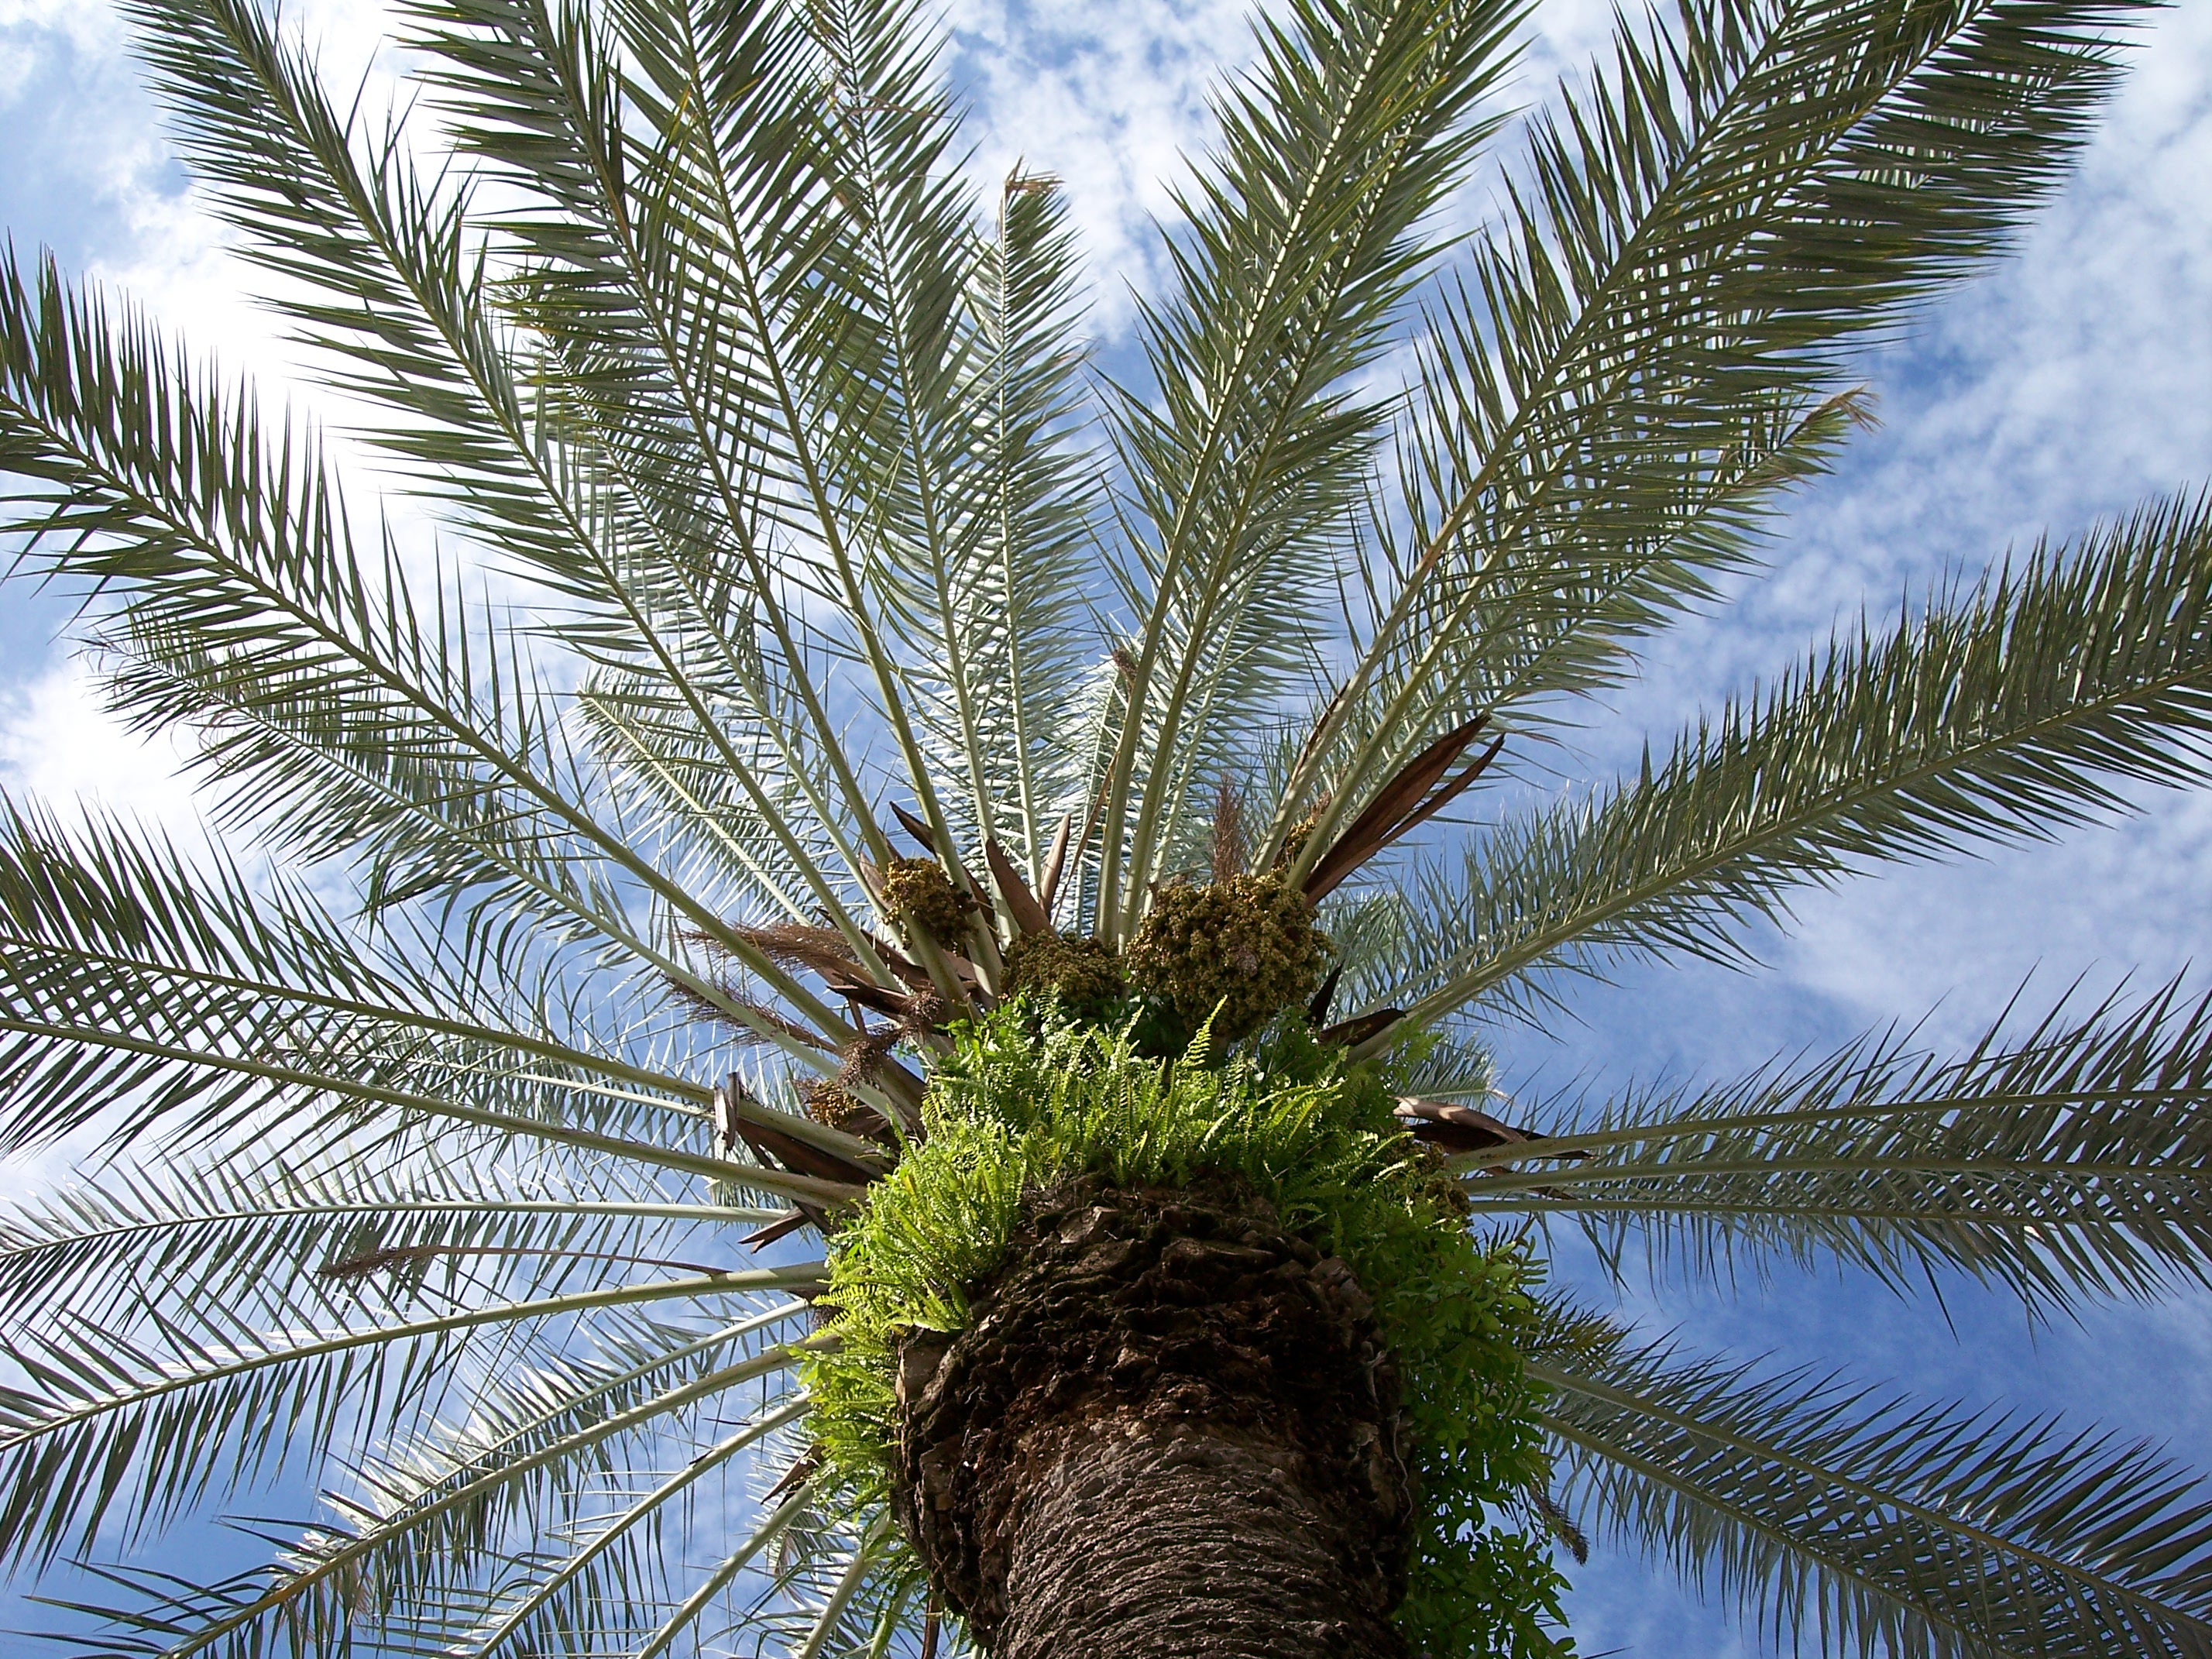 North Africa Phoenix Dactylifera seeds Origin 10 FRESH Date Palm